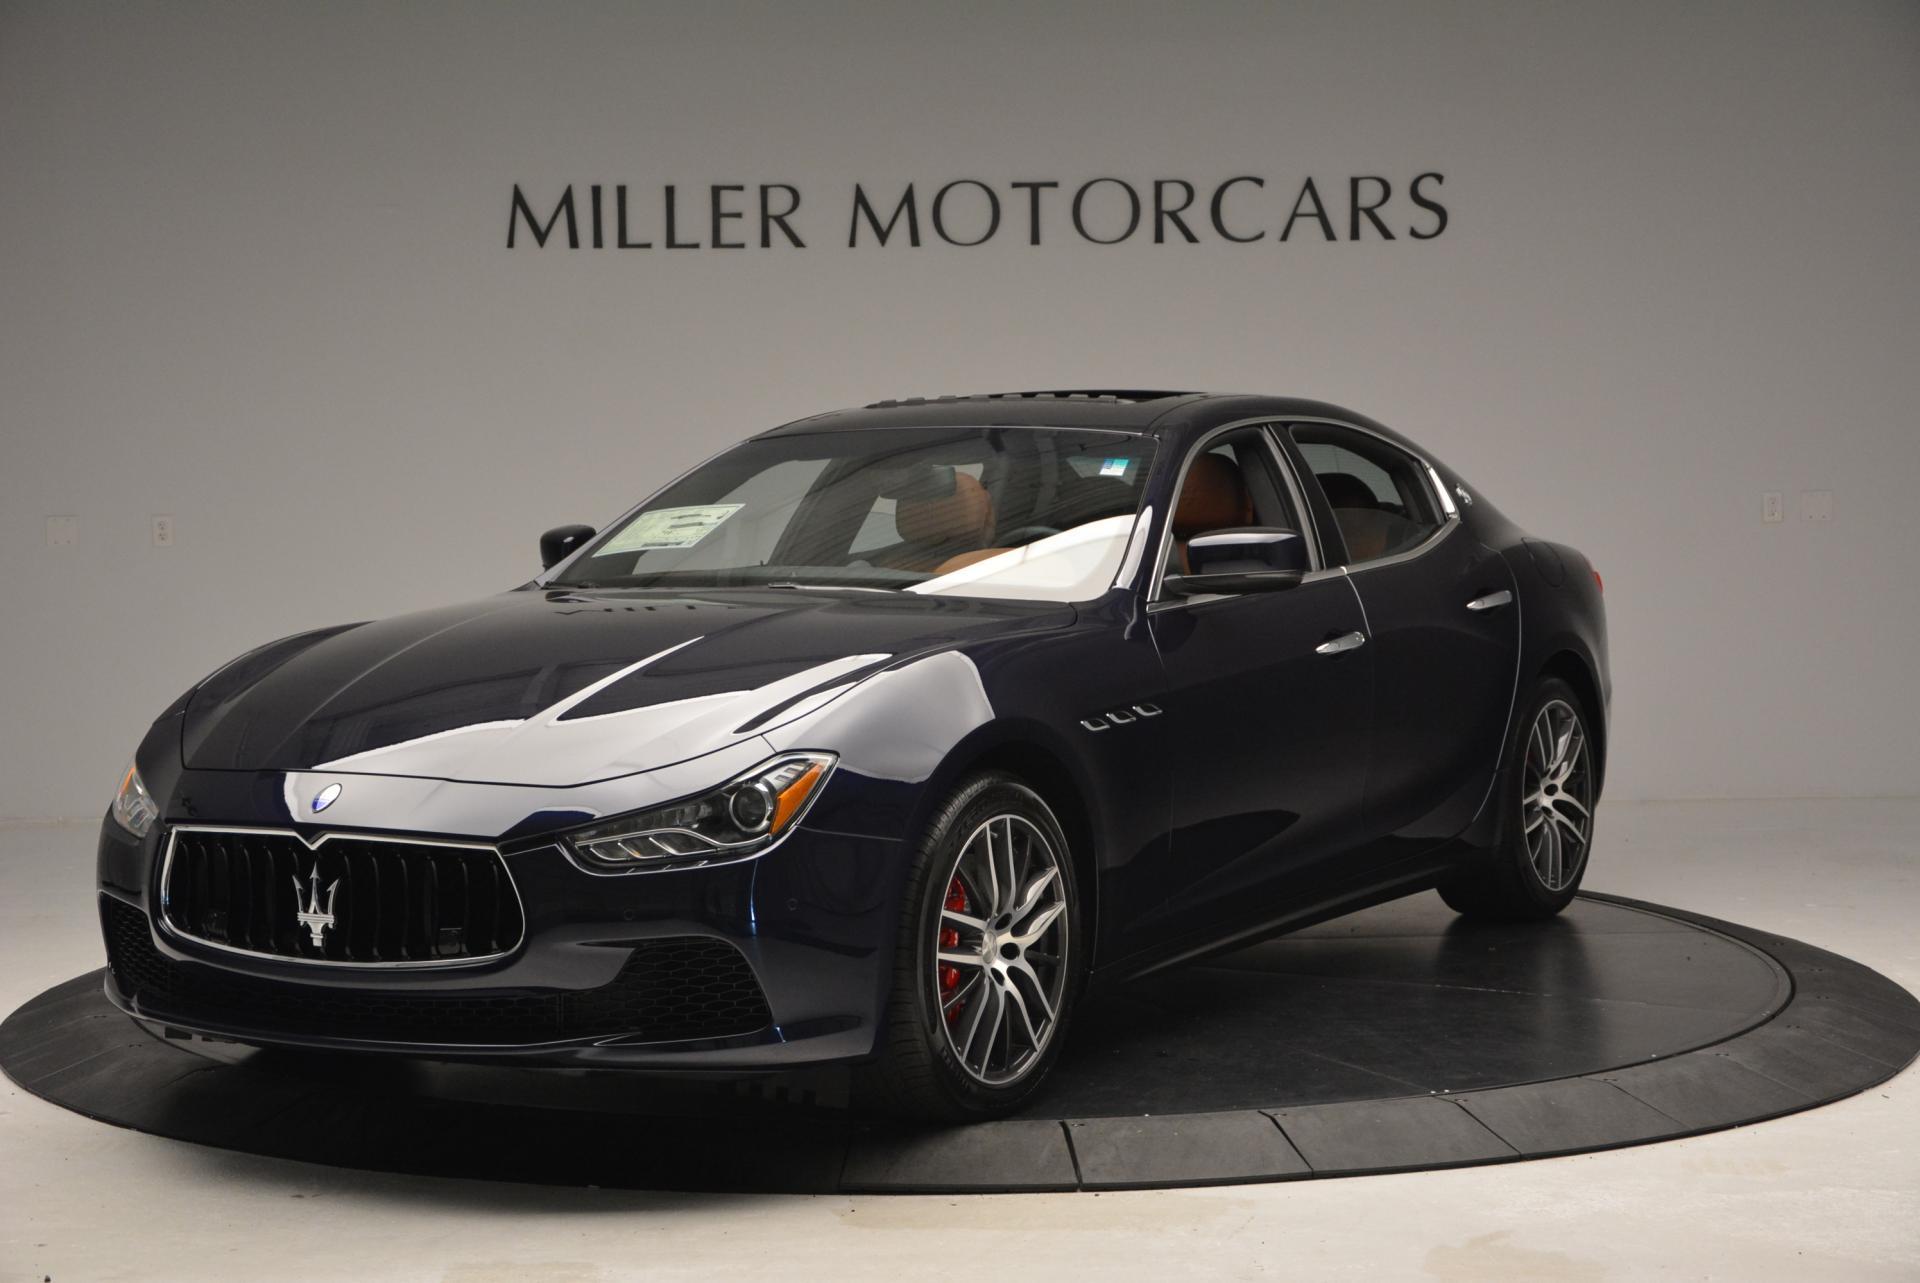 New 2016 Maserati Ghibli S Q4 For Sale In Greenwich, CT 52_main